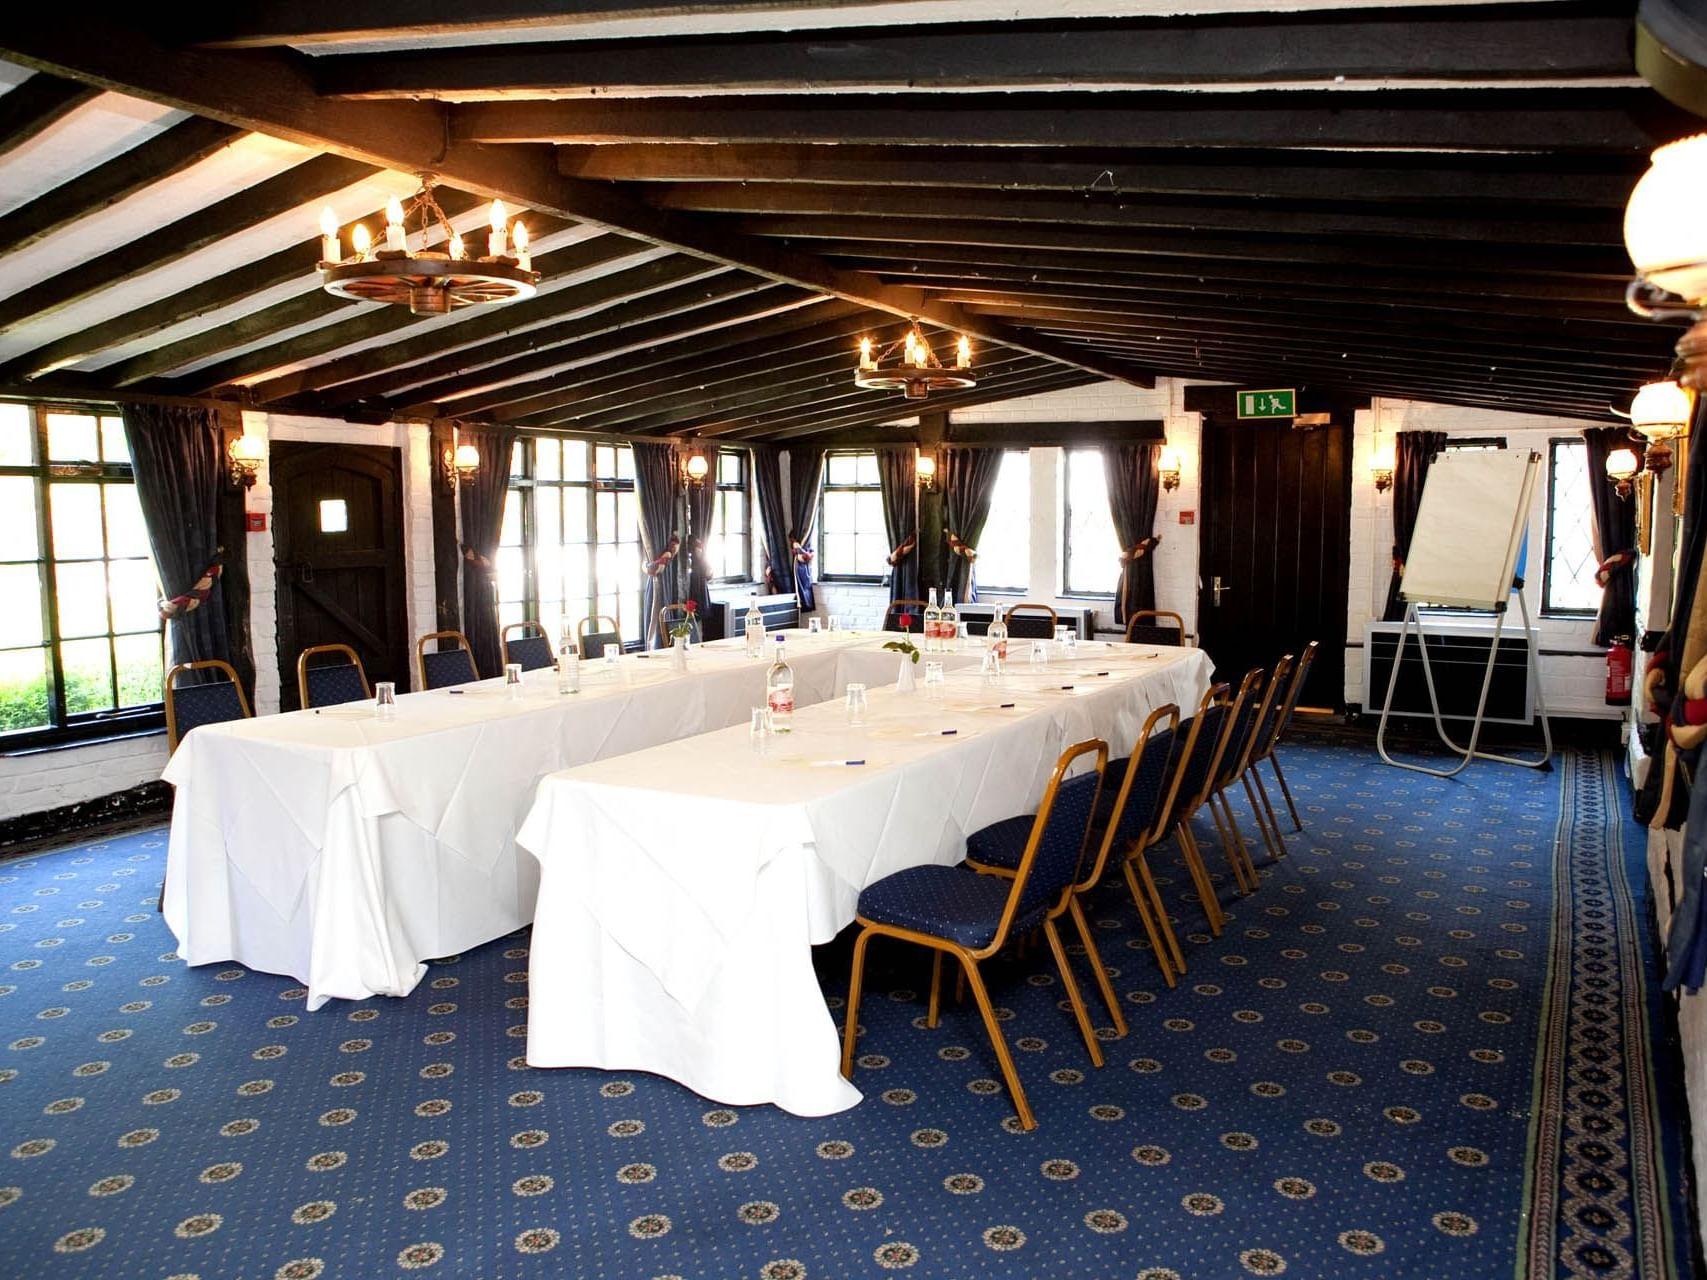 Cromwell Room at Barn Hotel Ruislip near London